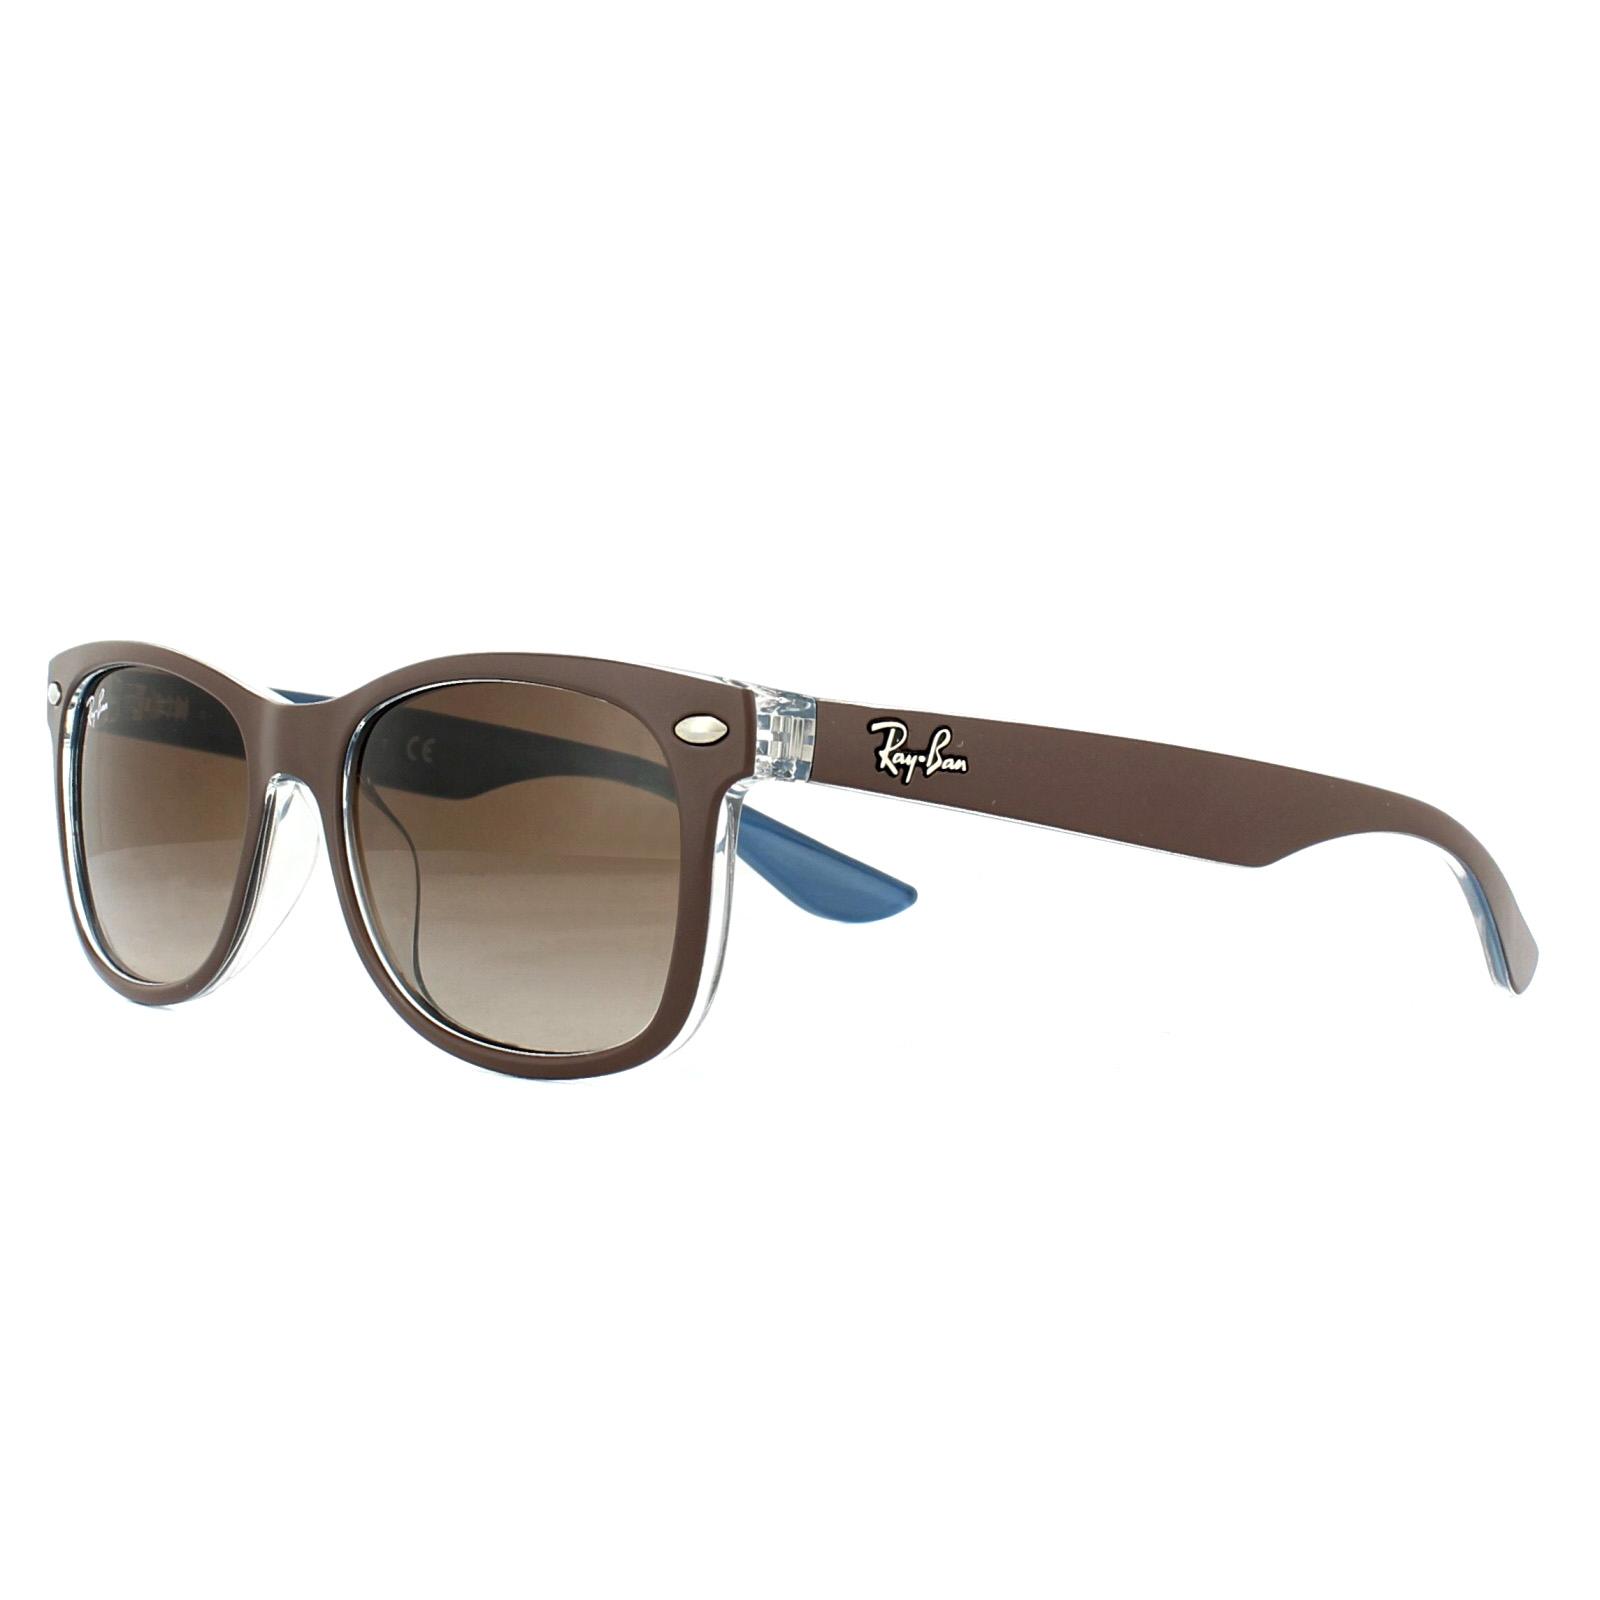 Sentinel Ray-Ban Junior Sunglasses New Wayfarer 9052S 703513 Brown BLue  Brown Gradient 47 7af8fb58bb